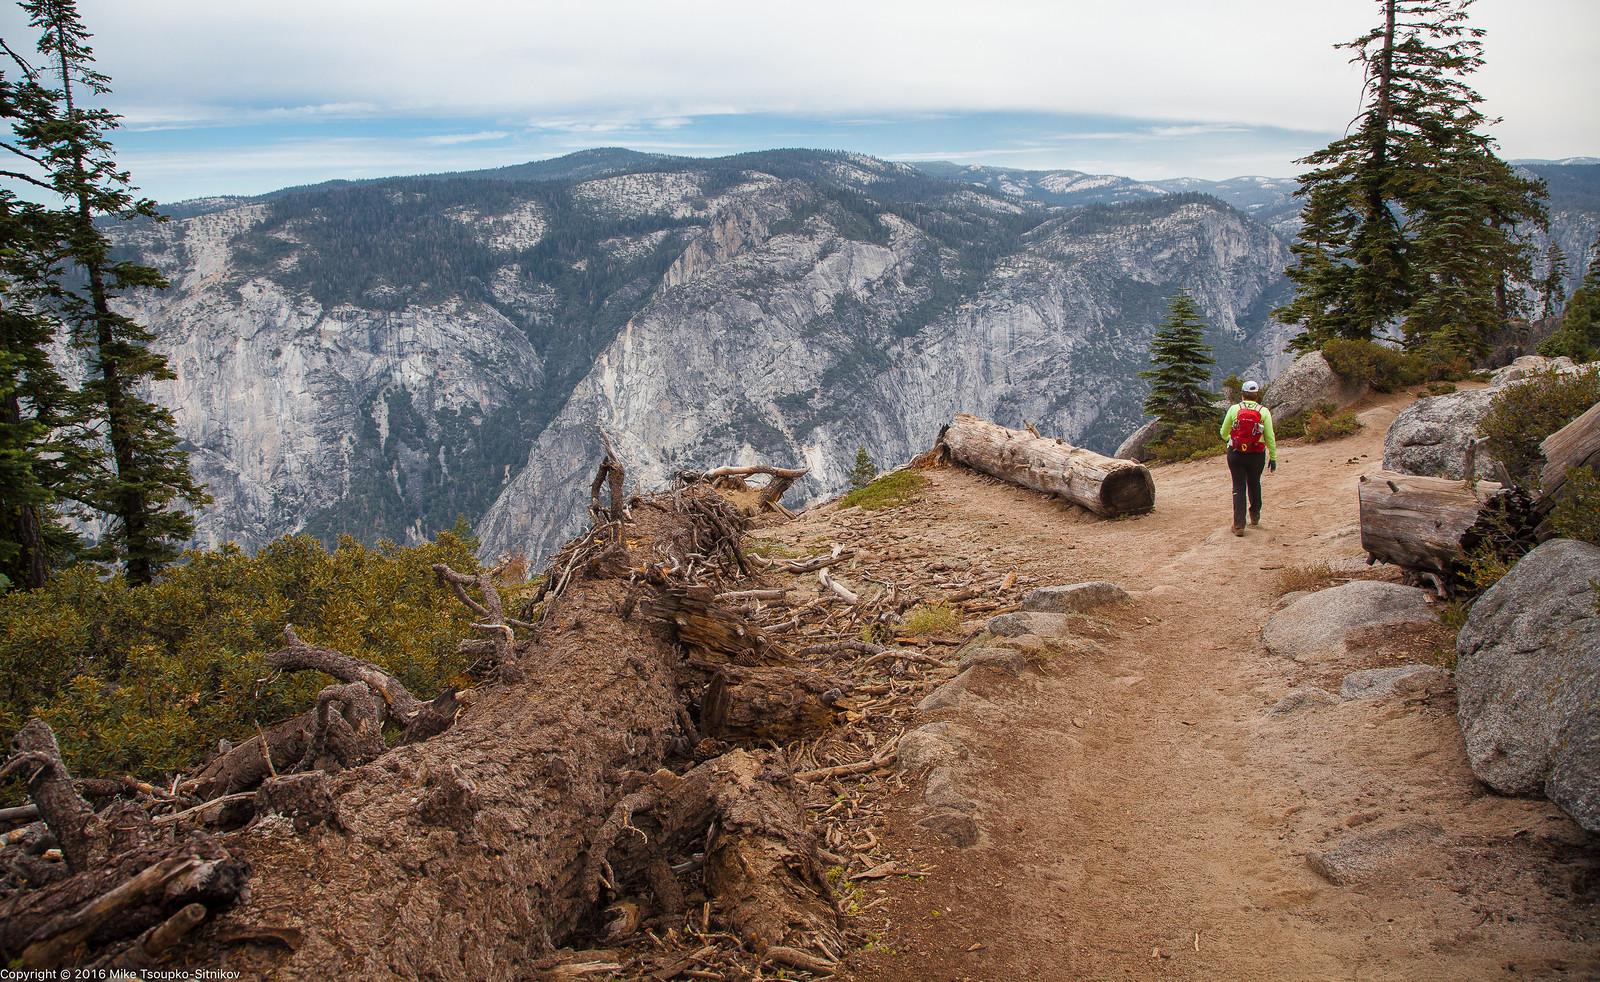 Pohono Trail in Yosemite